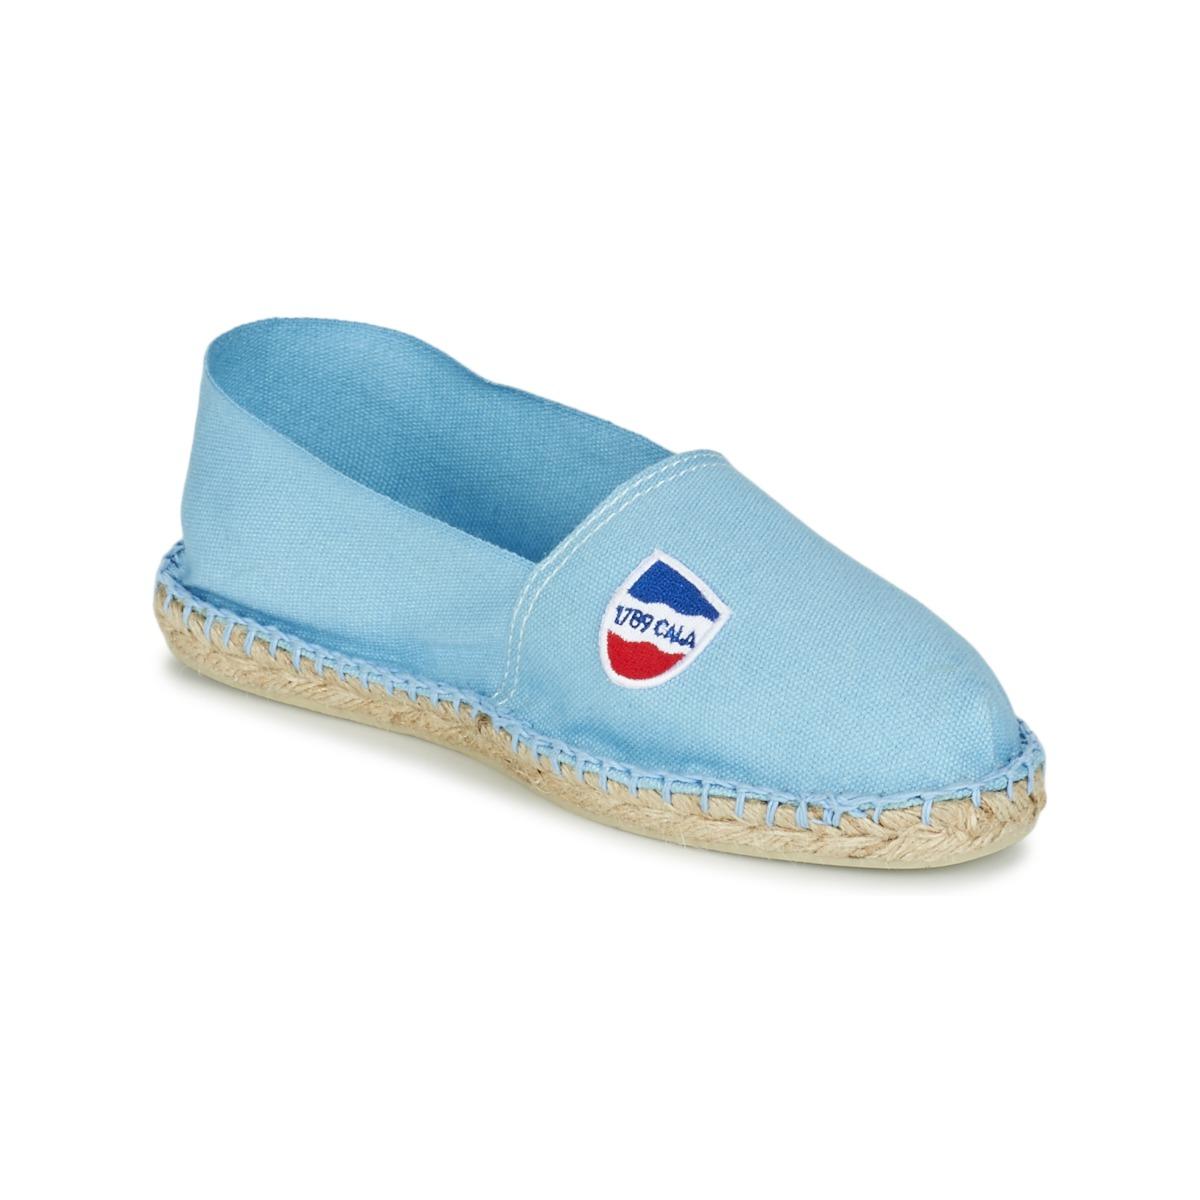 1789 Cala CLASSIQUE Blu